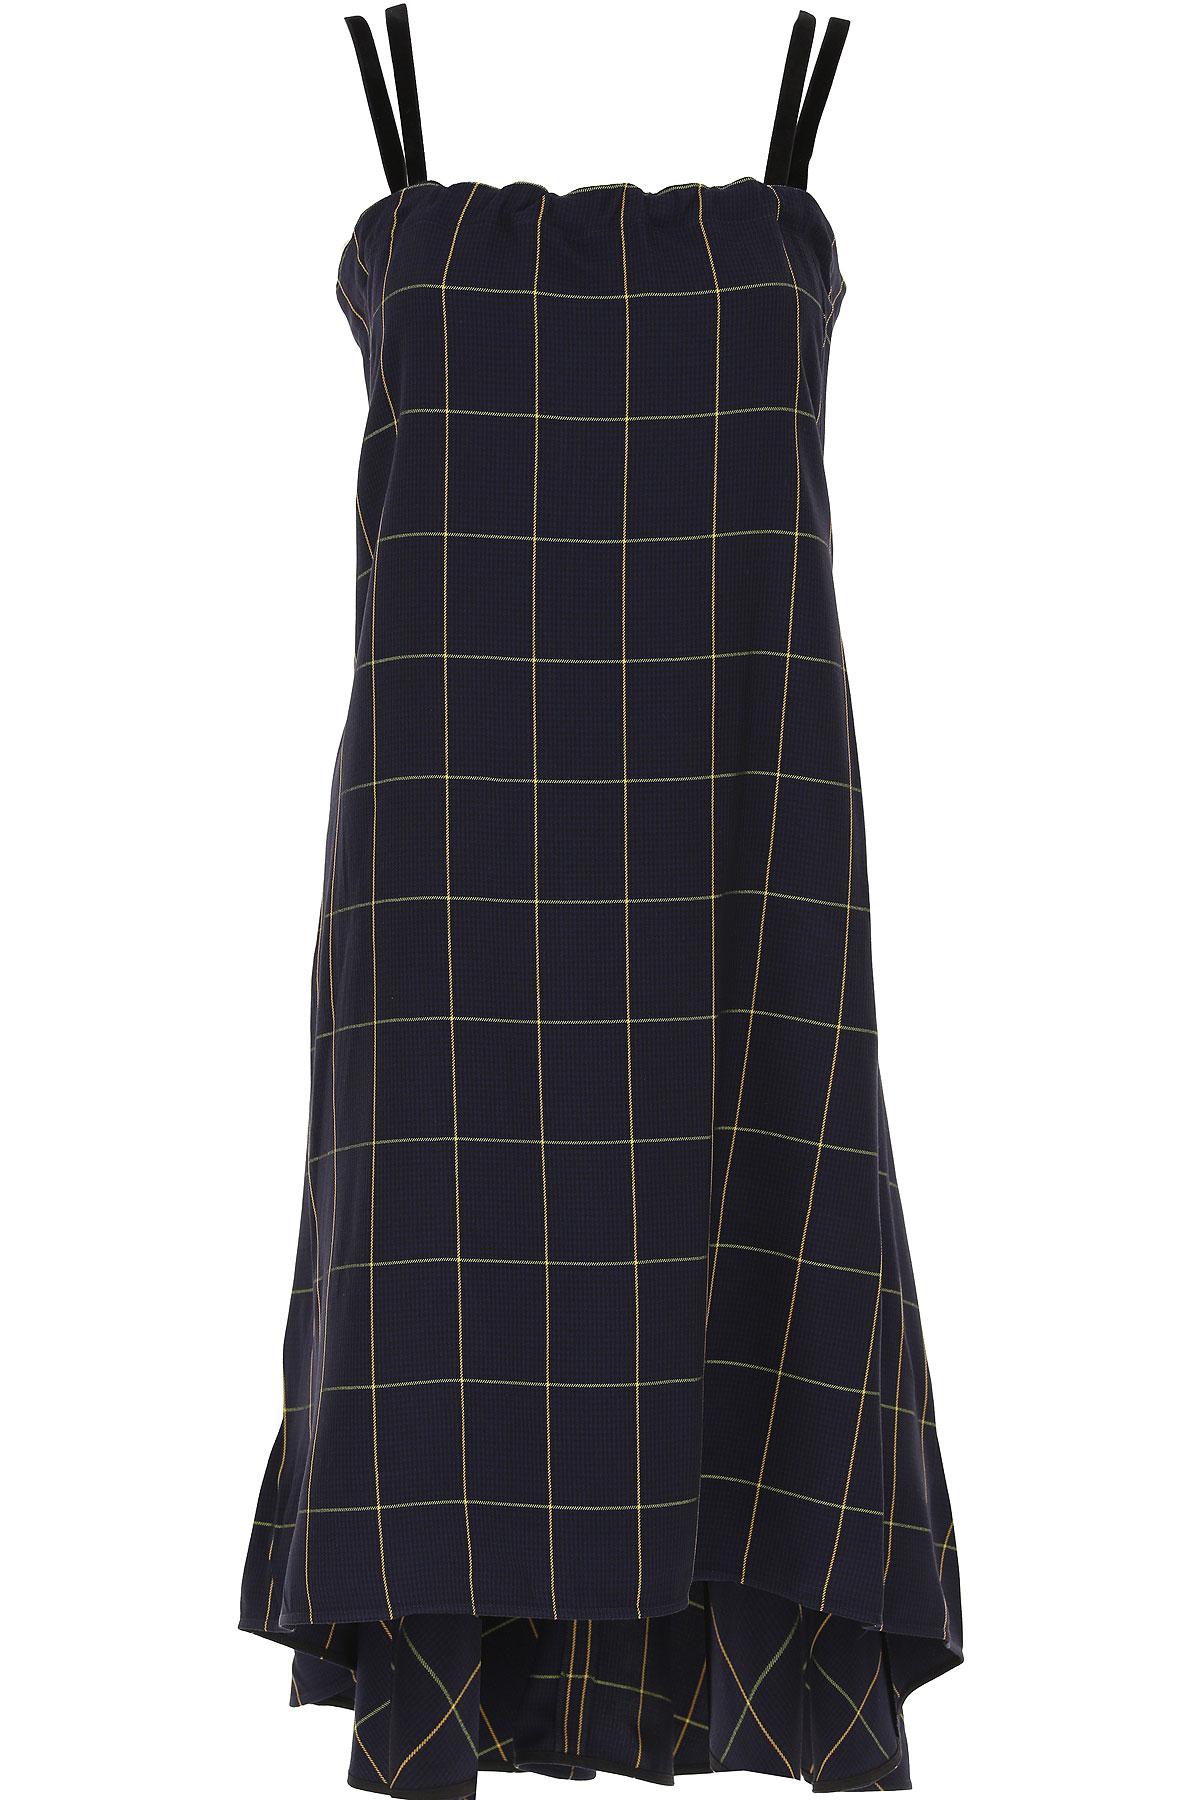 Alexander McQueen McQ Dress for Women, Evening Cocktail Party On Sale, Dark Midnight Blue, Cotton, 2019, 10 4 6 8